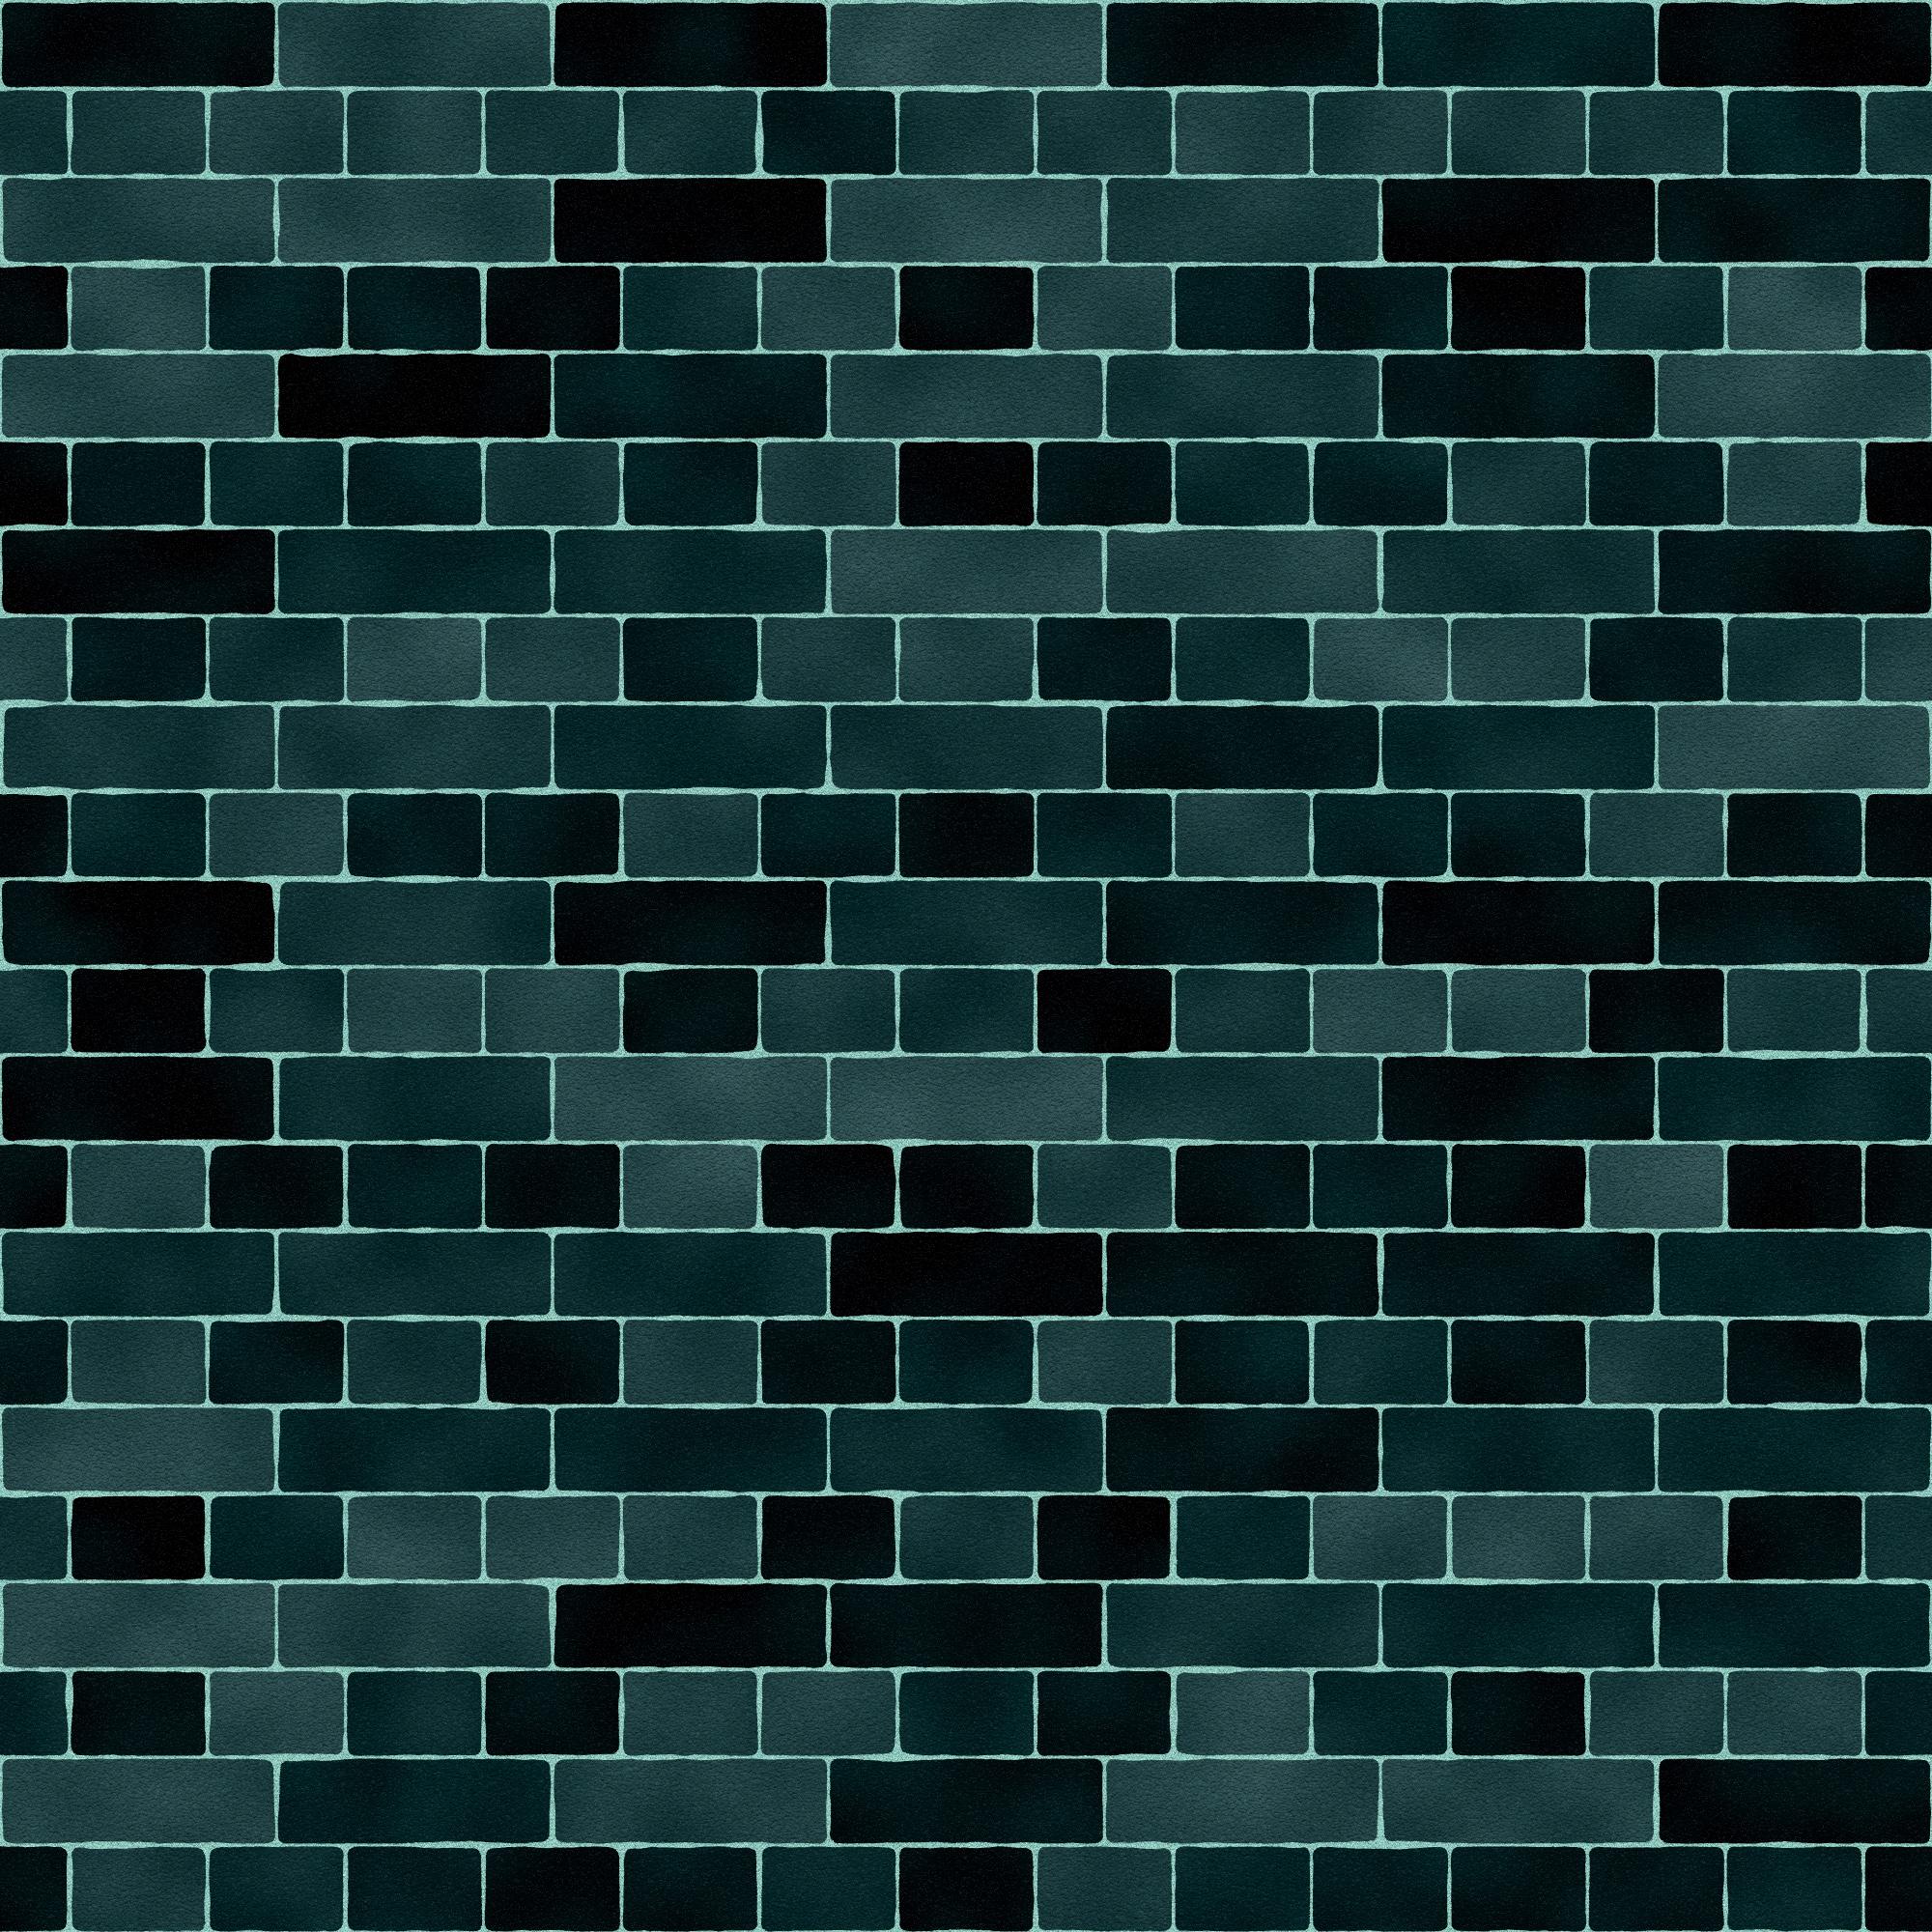 blue brick wall texture, brick wall, download photo, background, texture